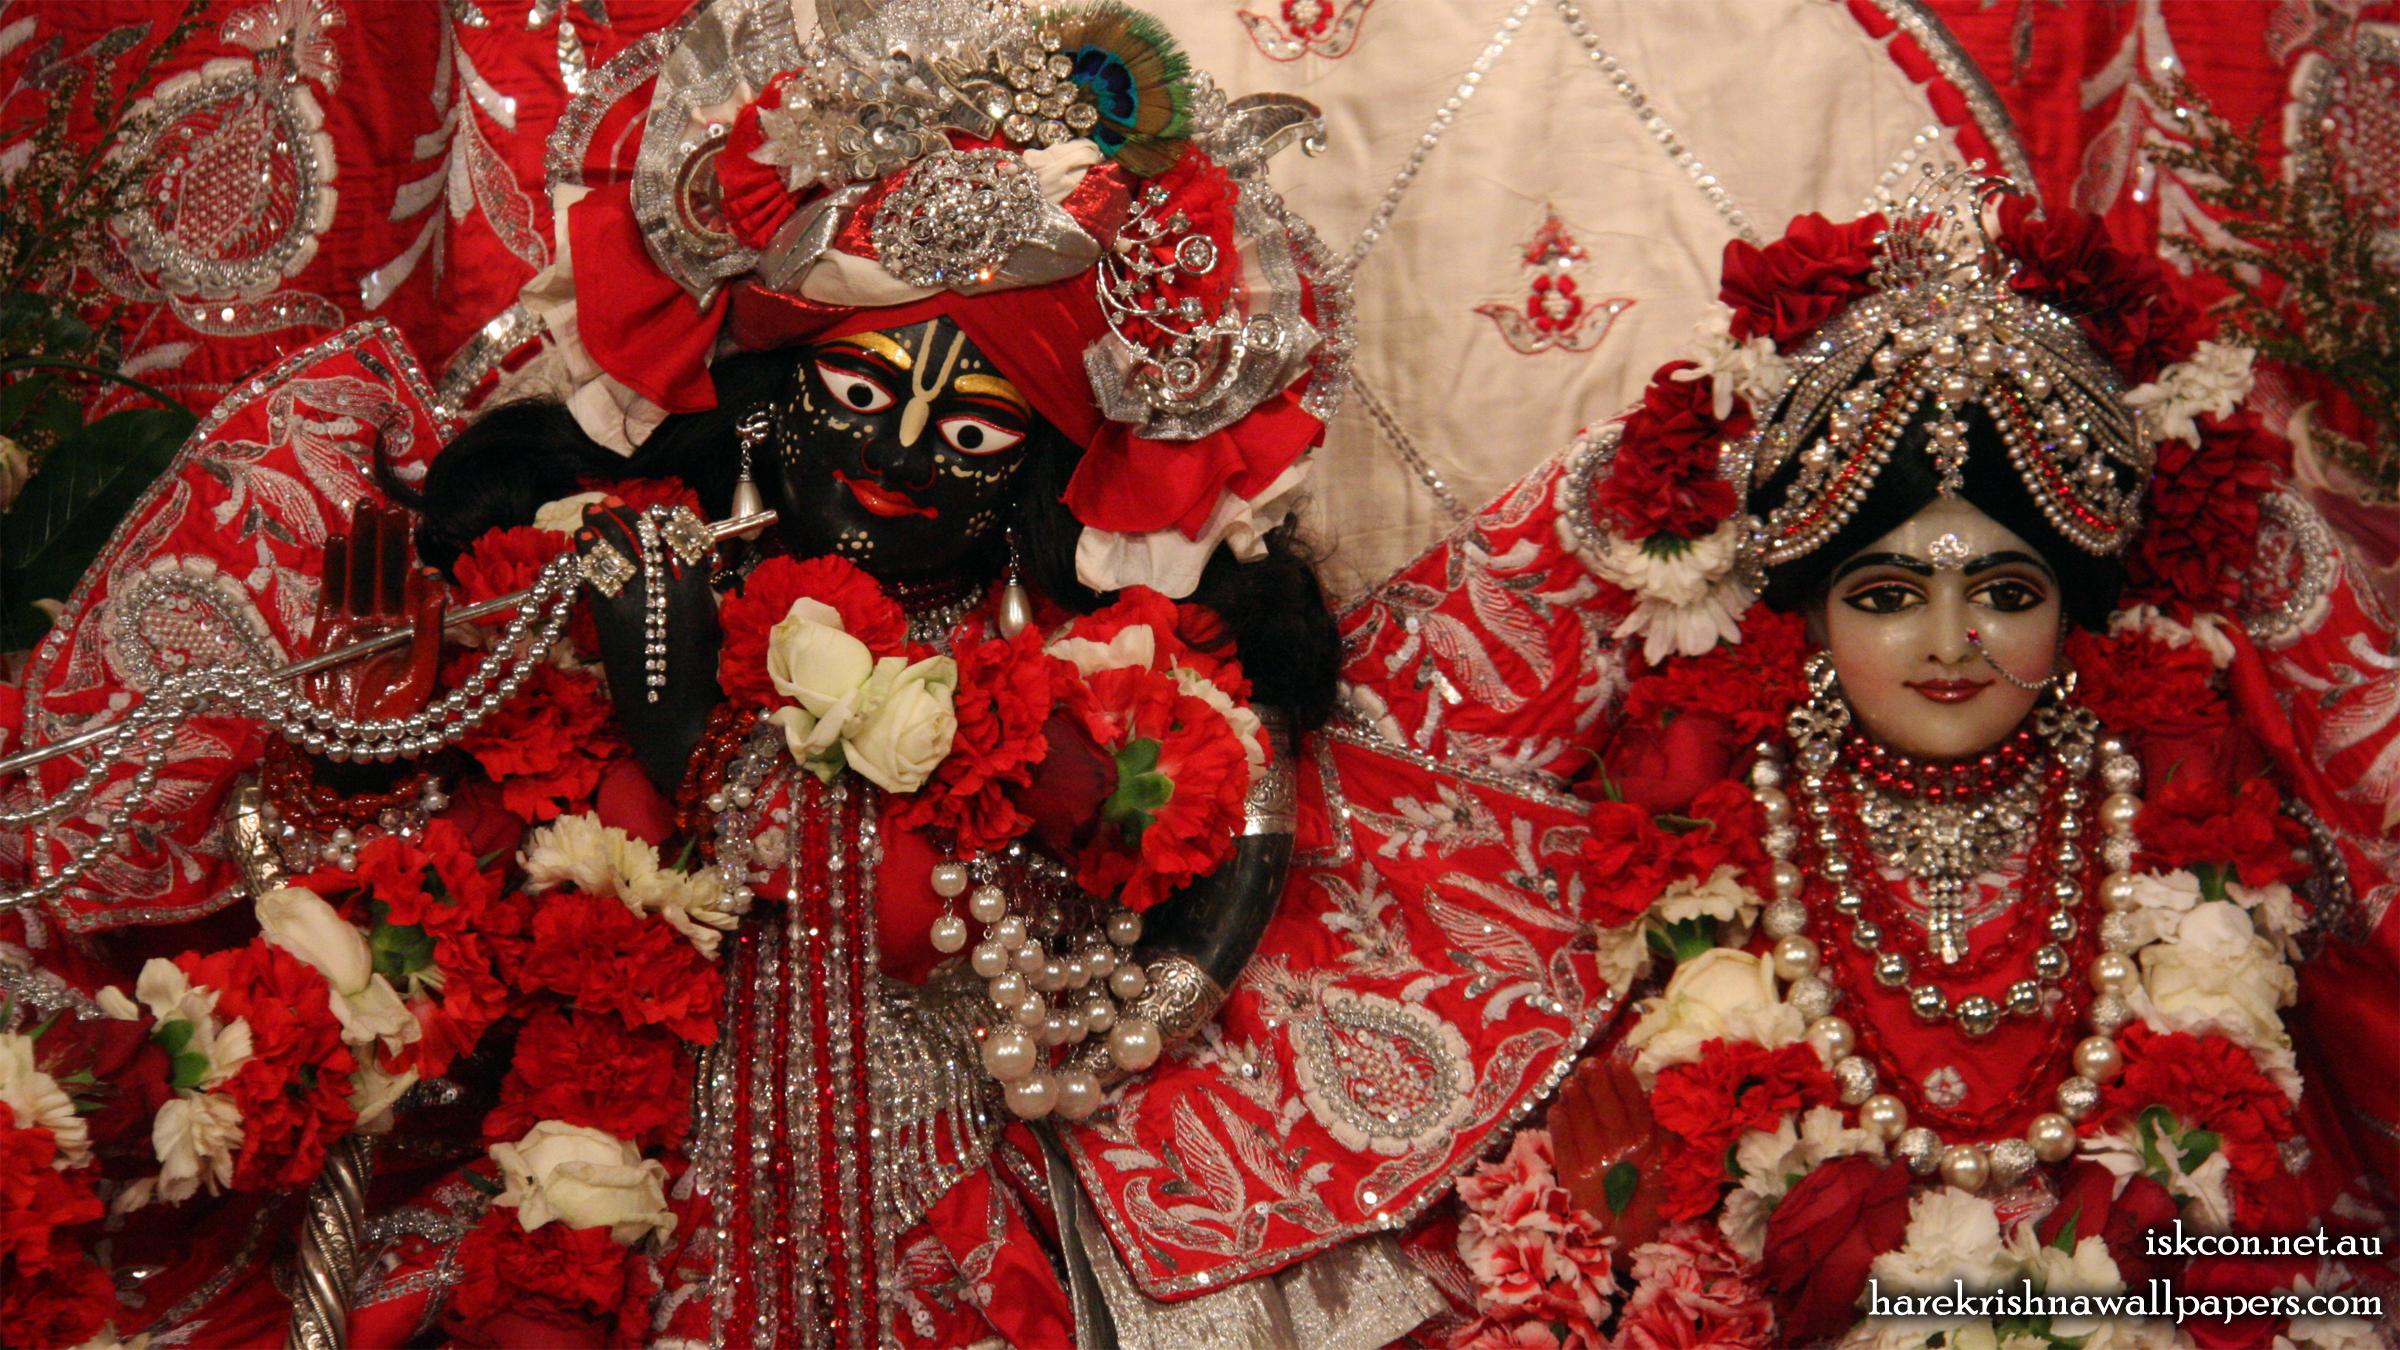 Sri Sri Radha Vallabh Close up Wallpaper (005) Size 2400x1350 Download